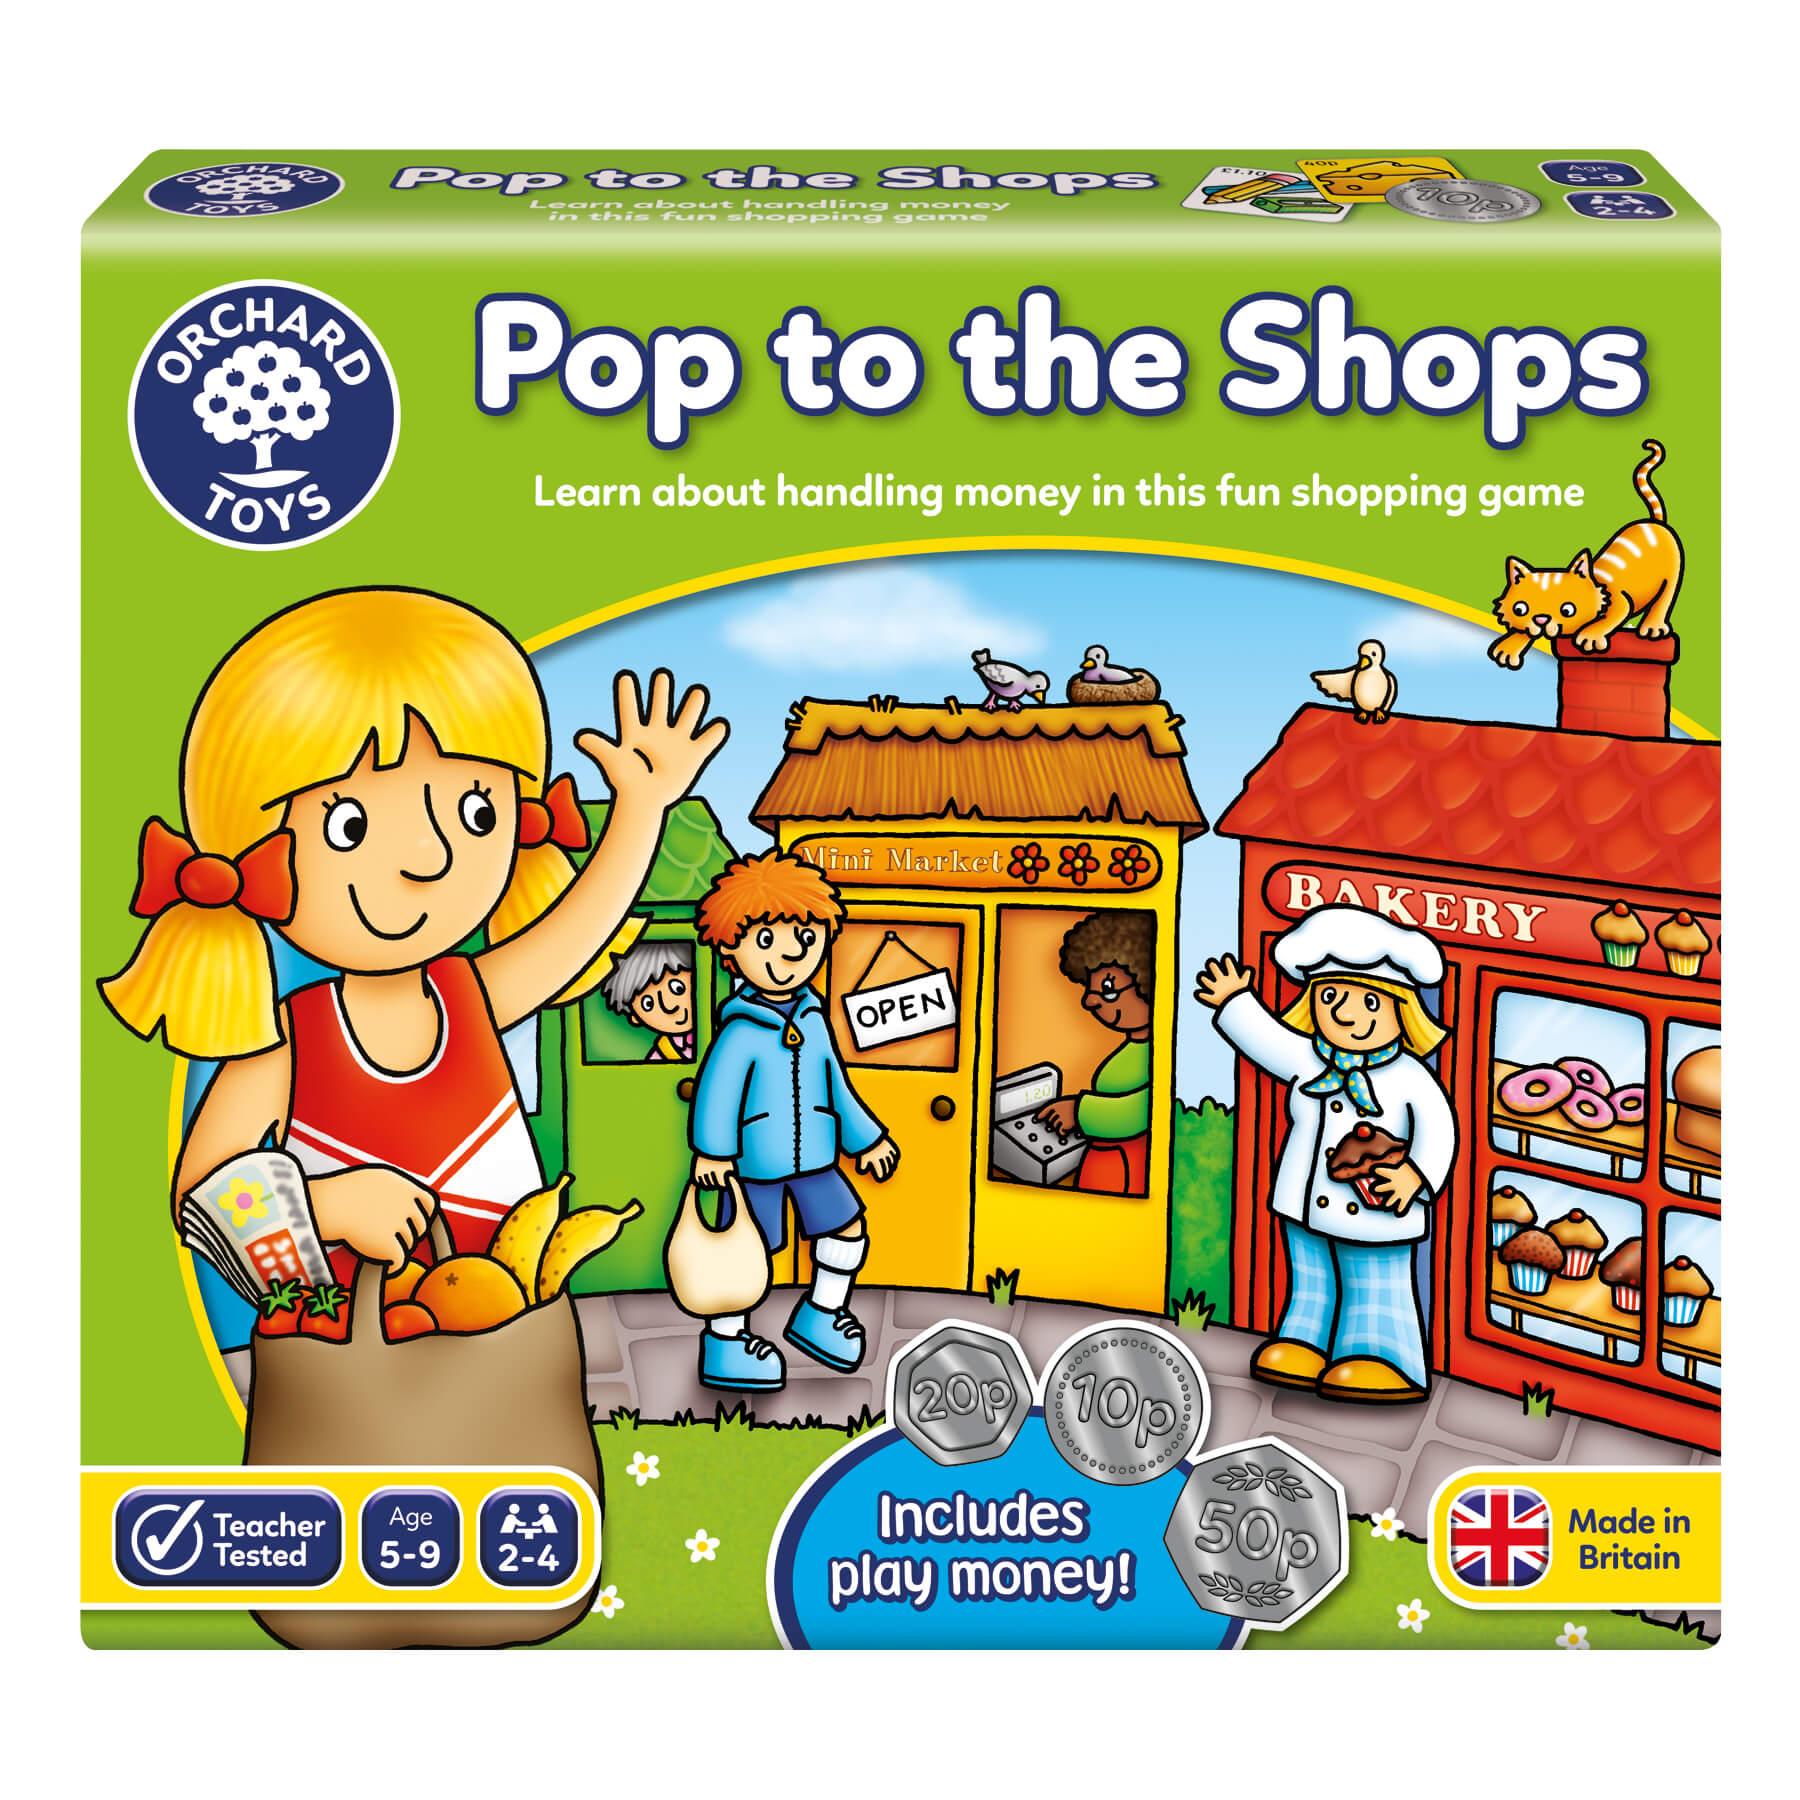 Orchard Pop To The Shops (Alışveriş Oyunu) 5-9 Yaş